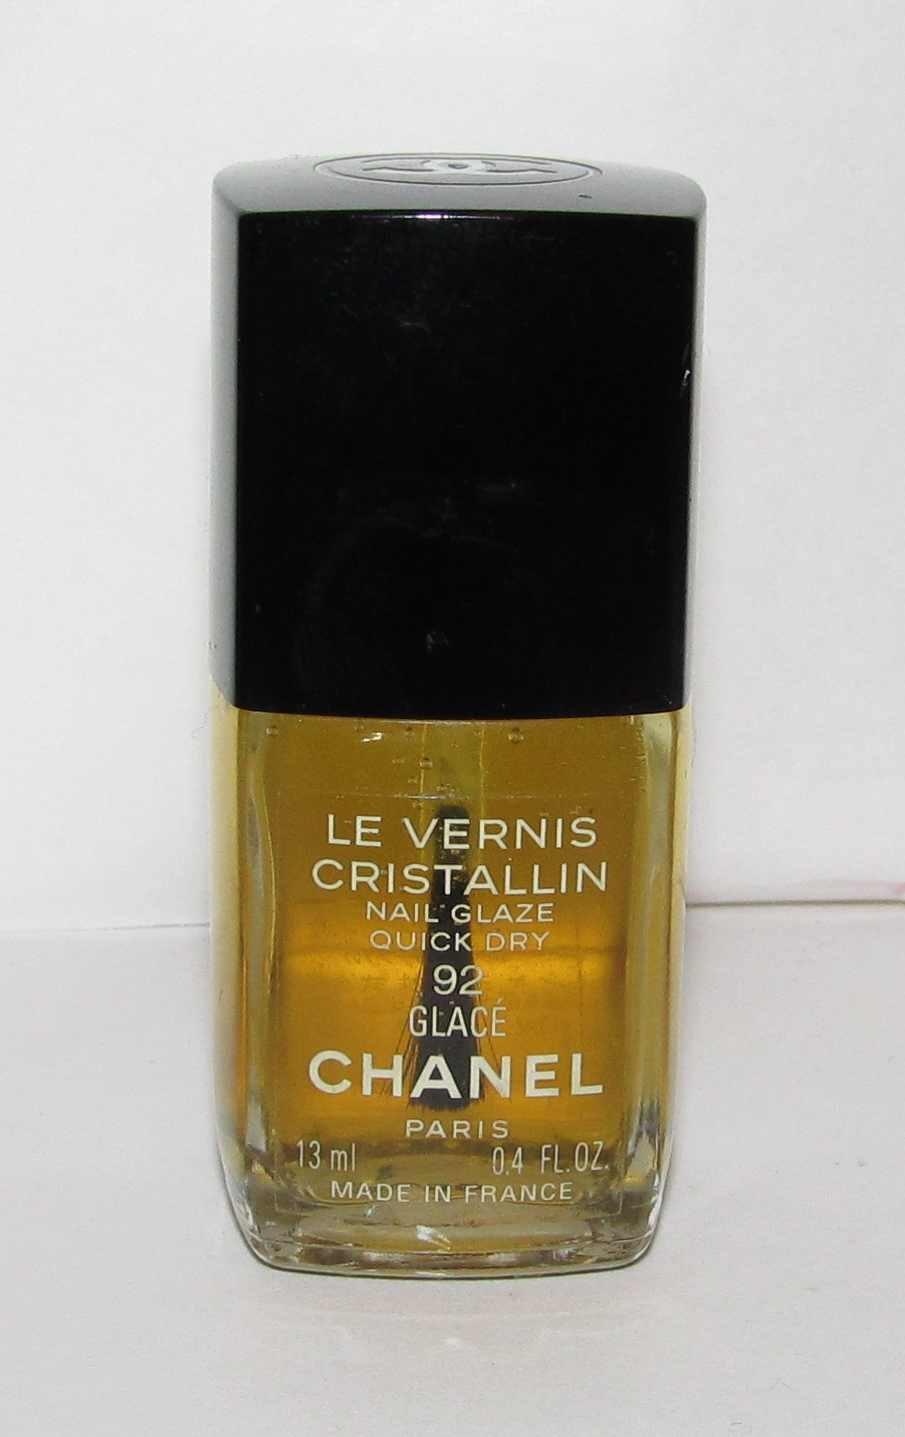 CHANEL - Glace Nail Glaze - NEW